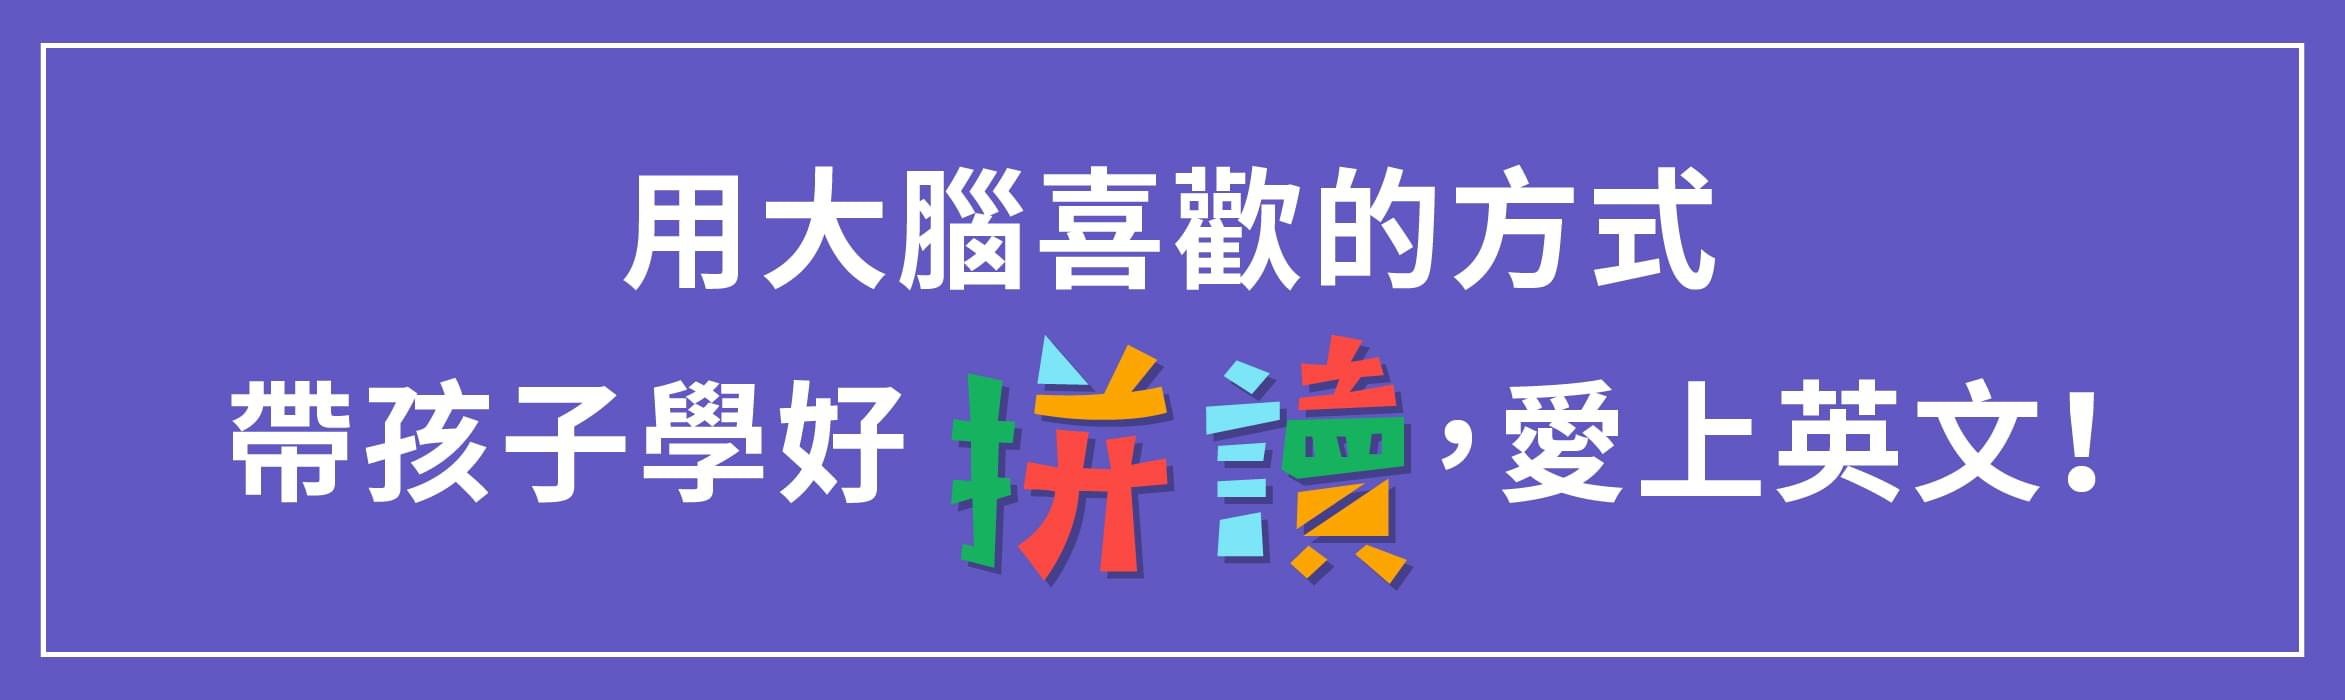 Ping English 建立黃金語感拼讀課 帶孩子學好拼讀,愛上英文